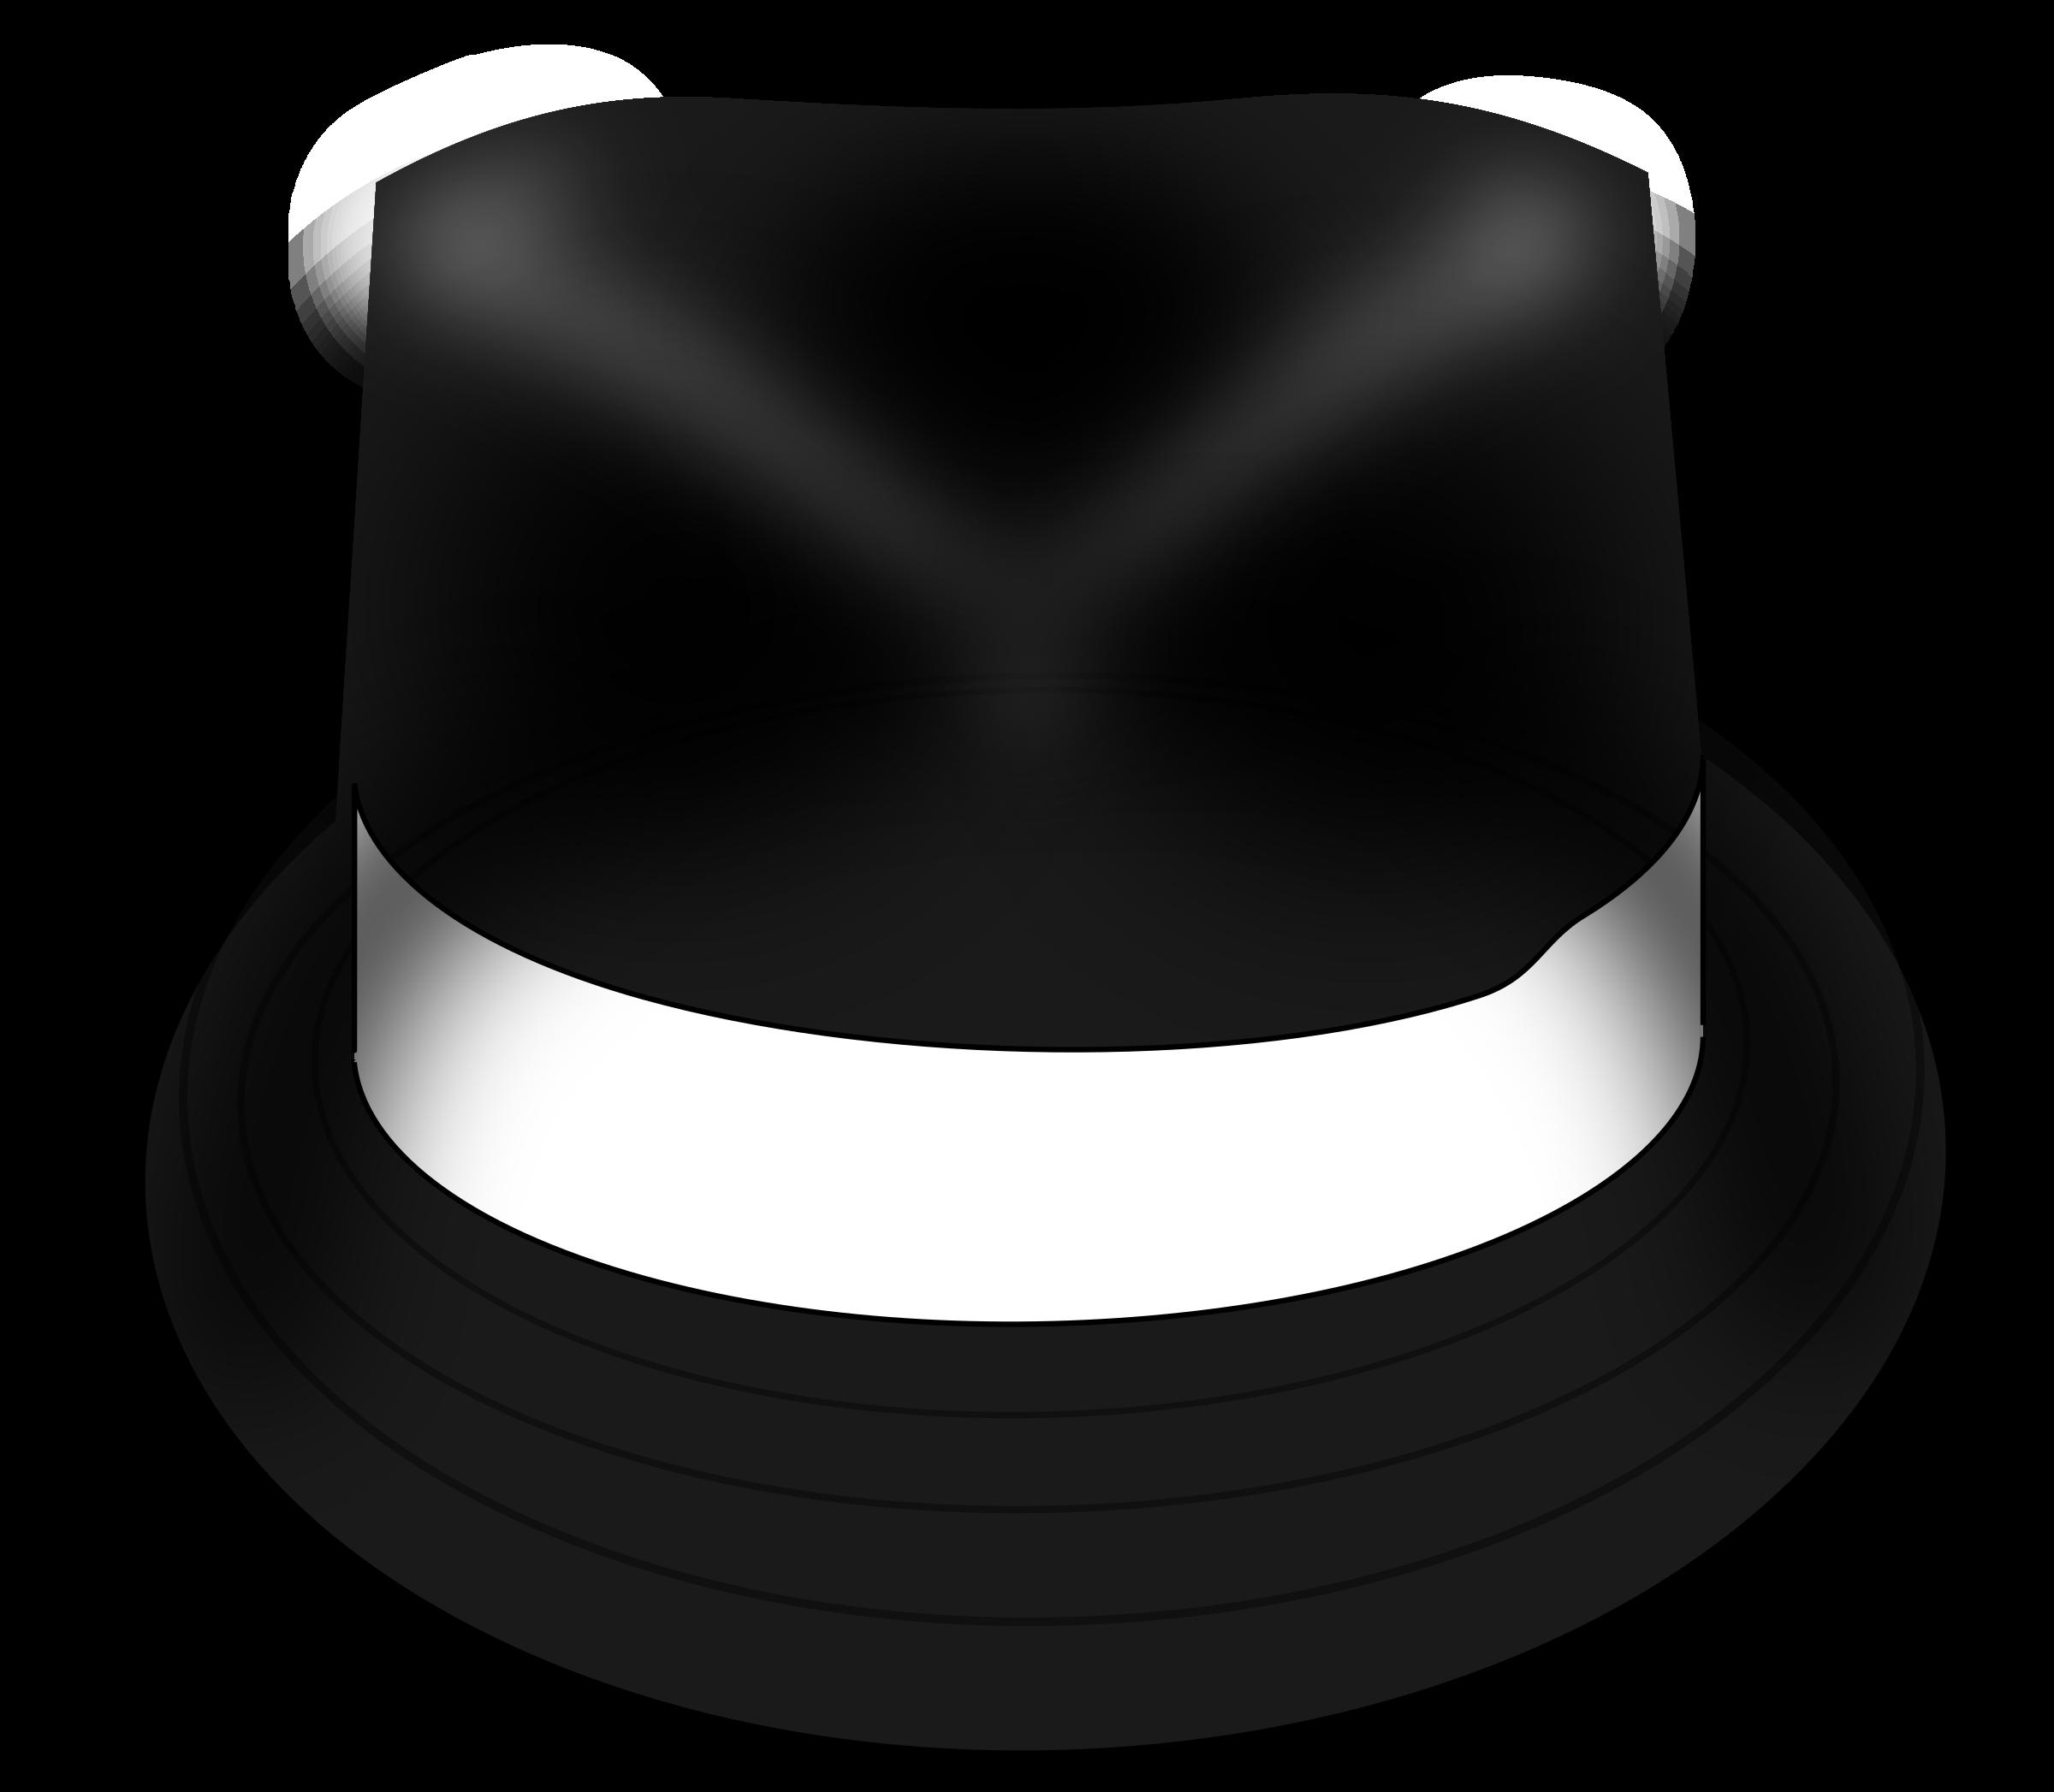 Hat trilby big image. Fedora clipart headwear